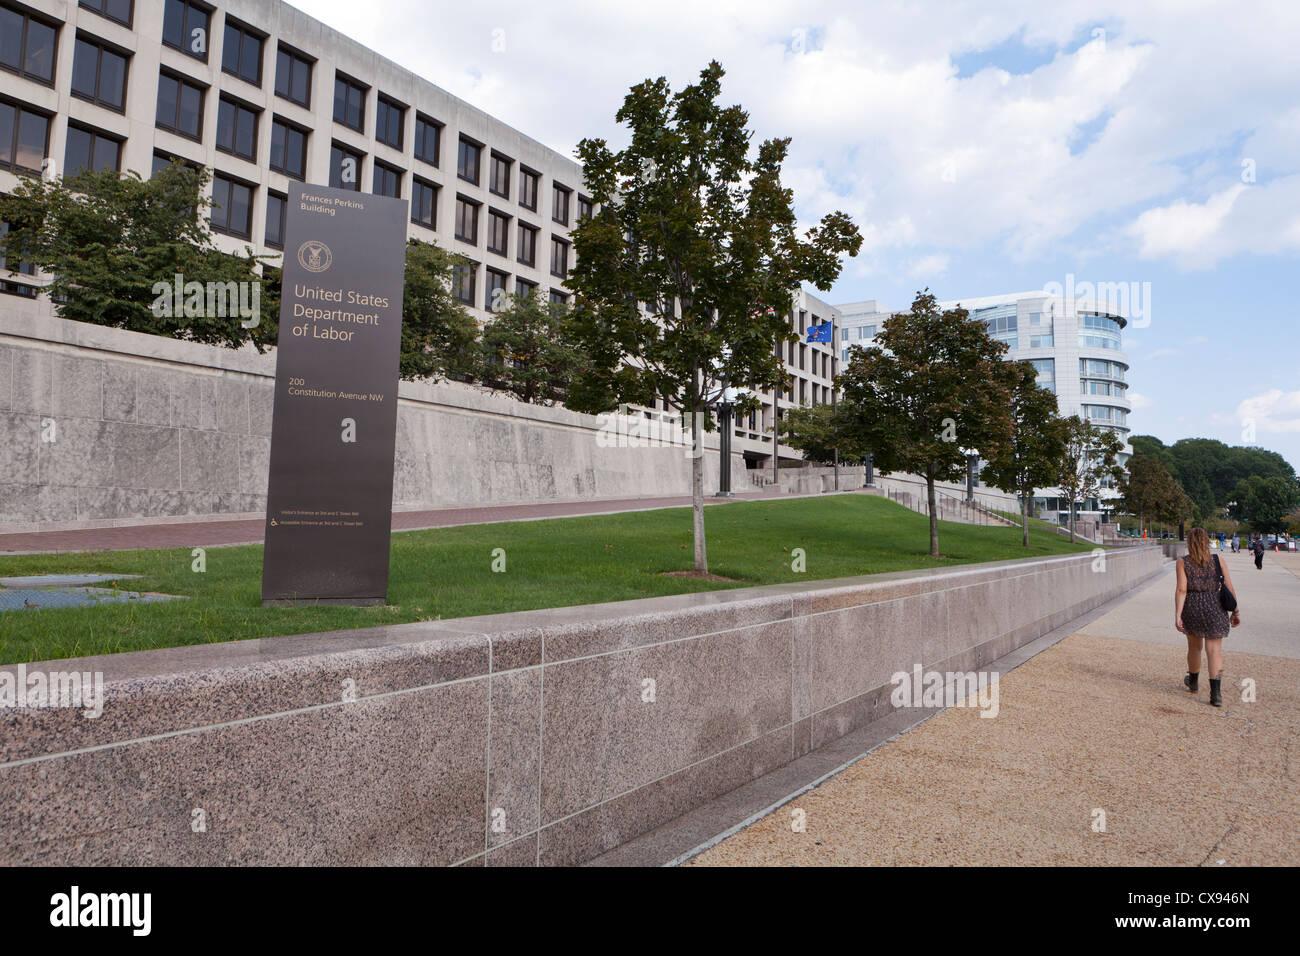 US Department of Labor headquarters - Washington, DC USA - Stock Image